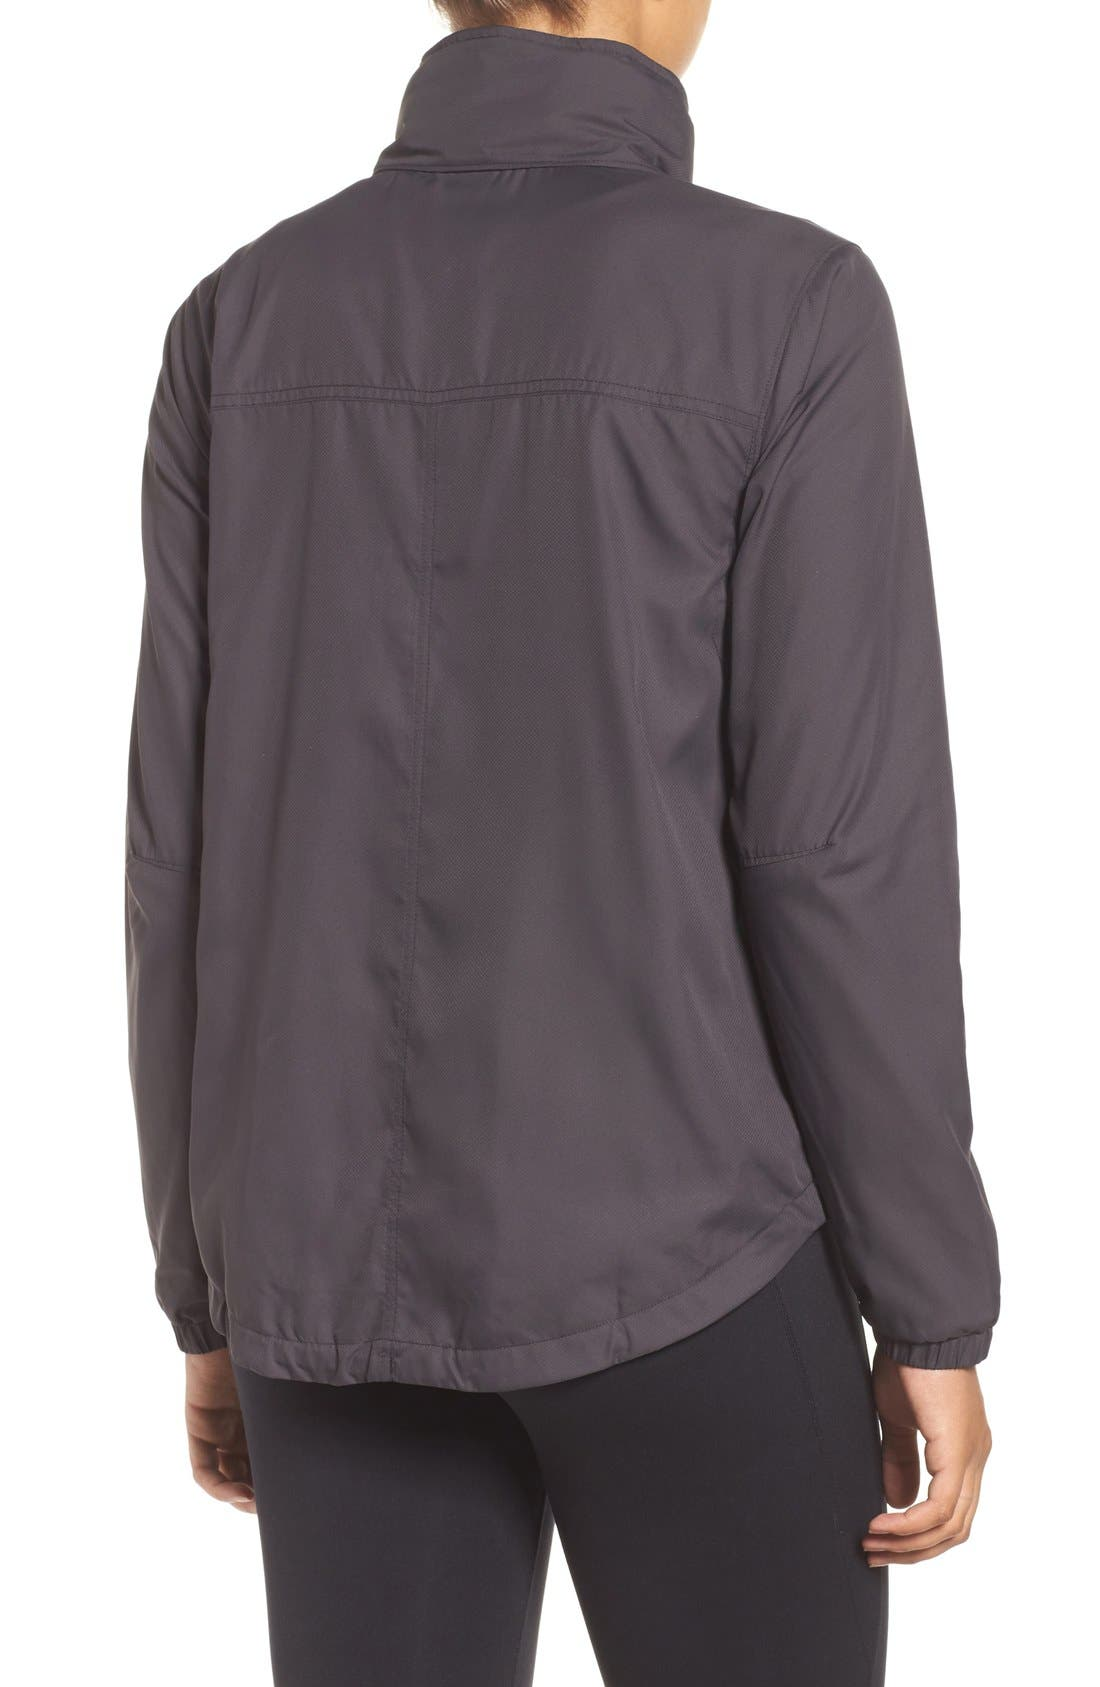 Mountain View Windbreaker Jacket,                             Alternate thumbnail 2, color,                             Ink Black